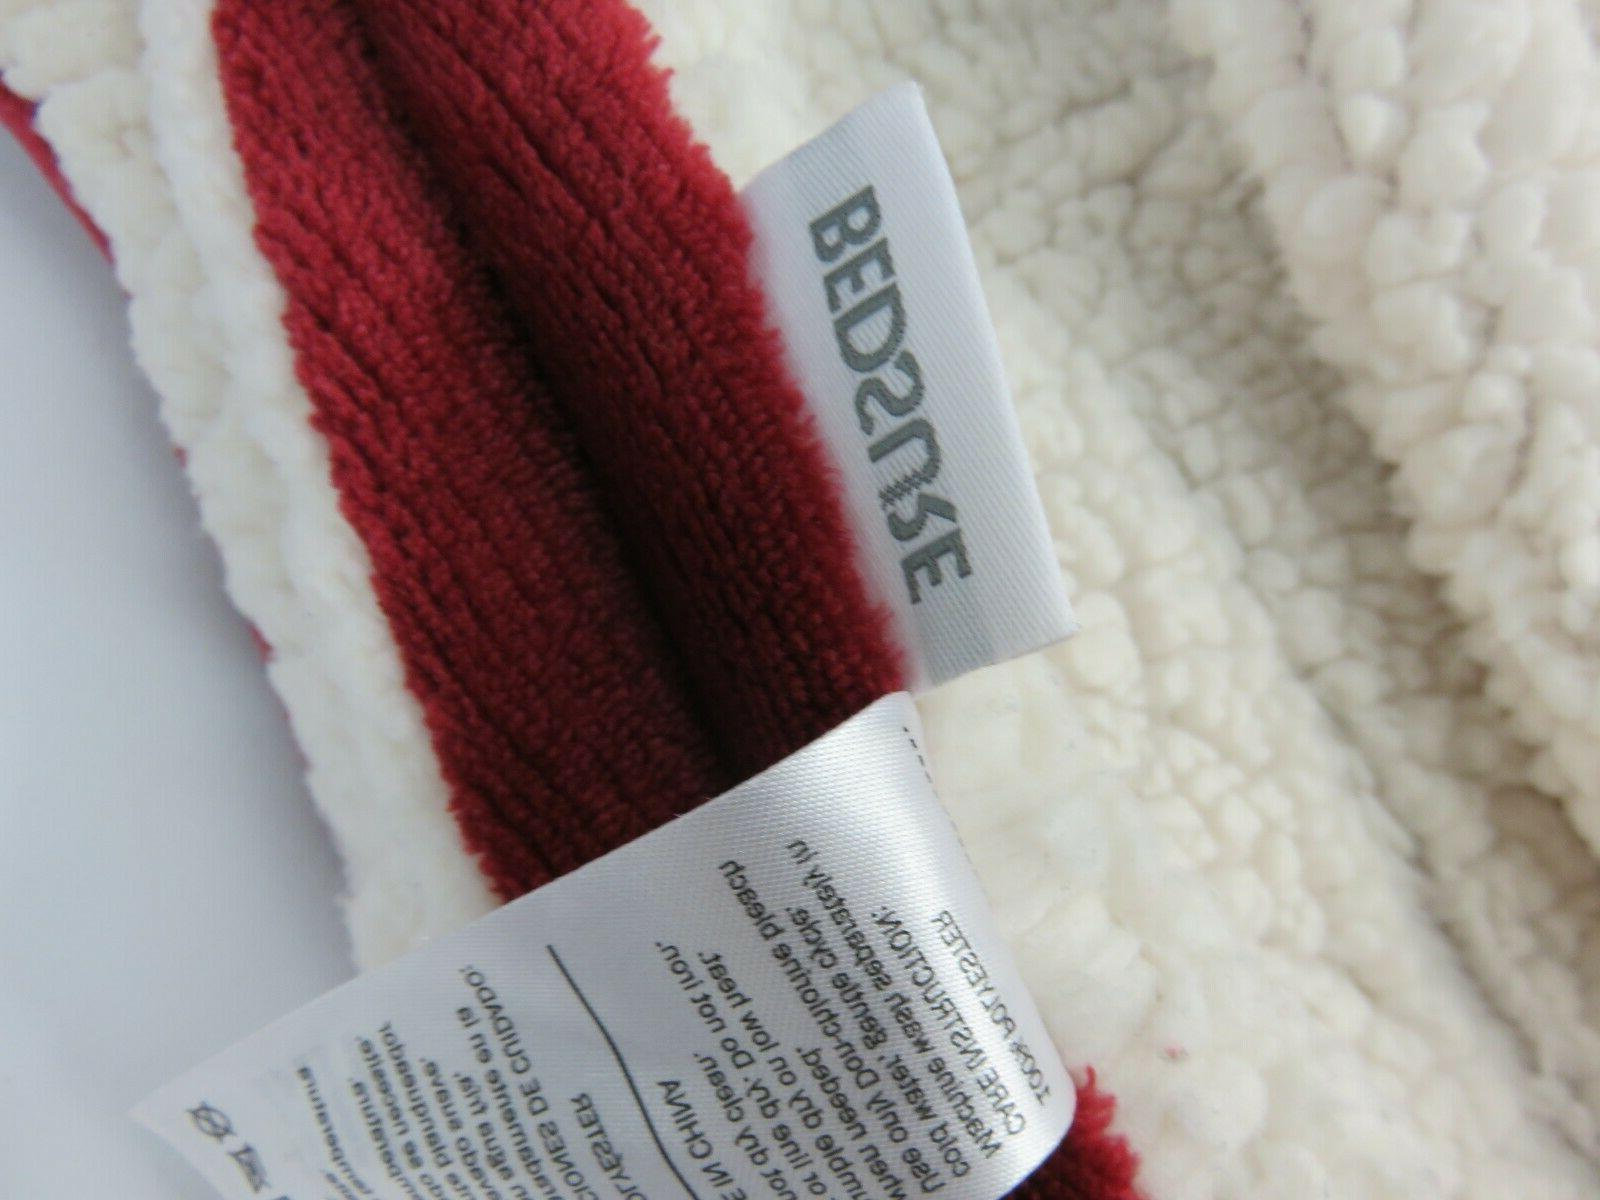 BEDSURE Sherpa Blanket 65in x Plush Fuzzy Soft